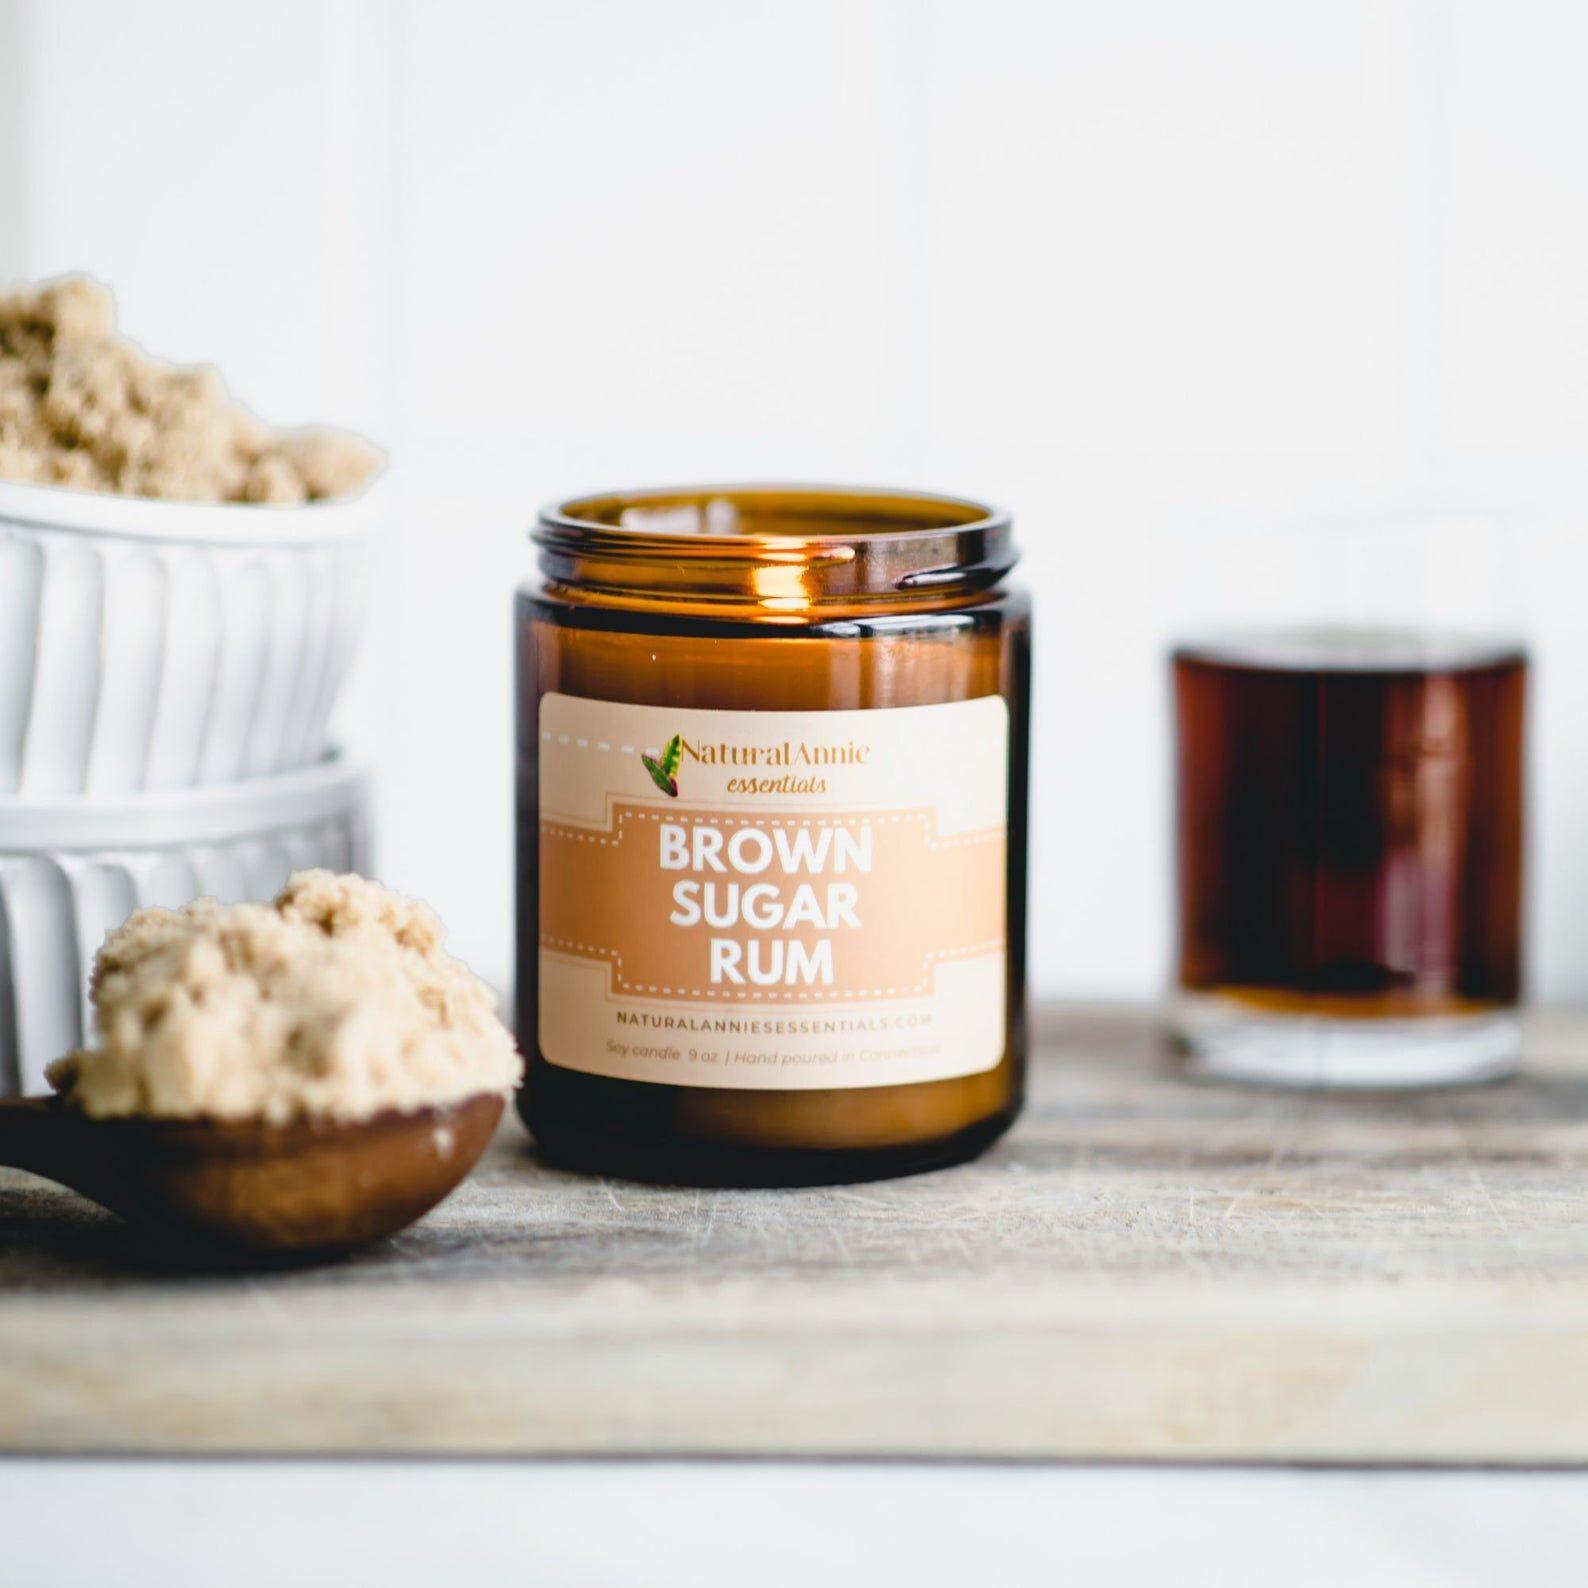 Brown Sugar Rum Candle